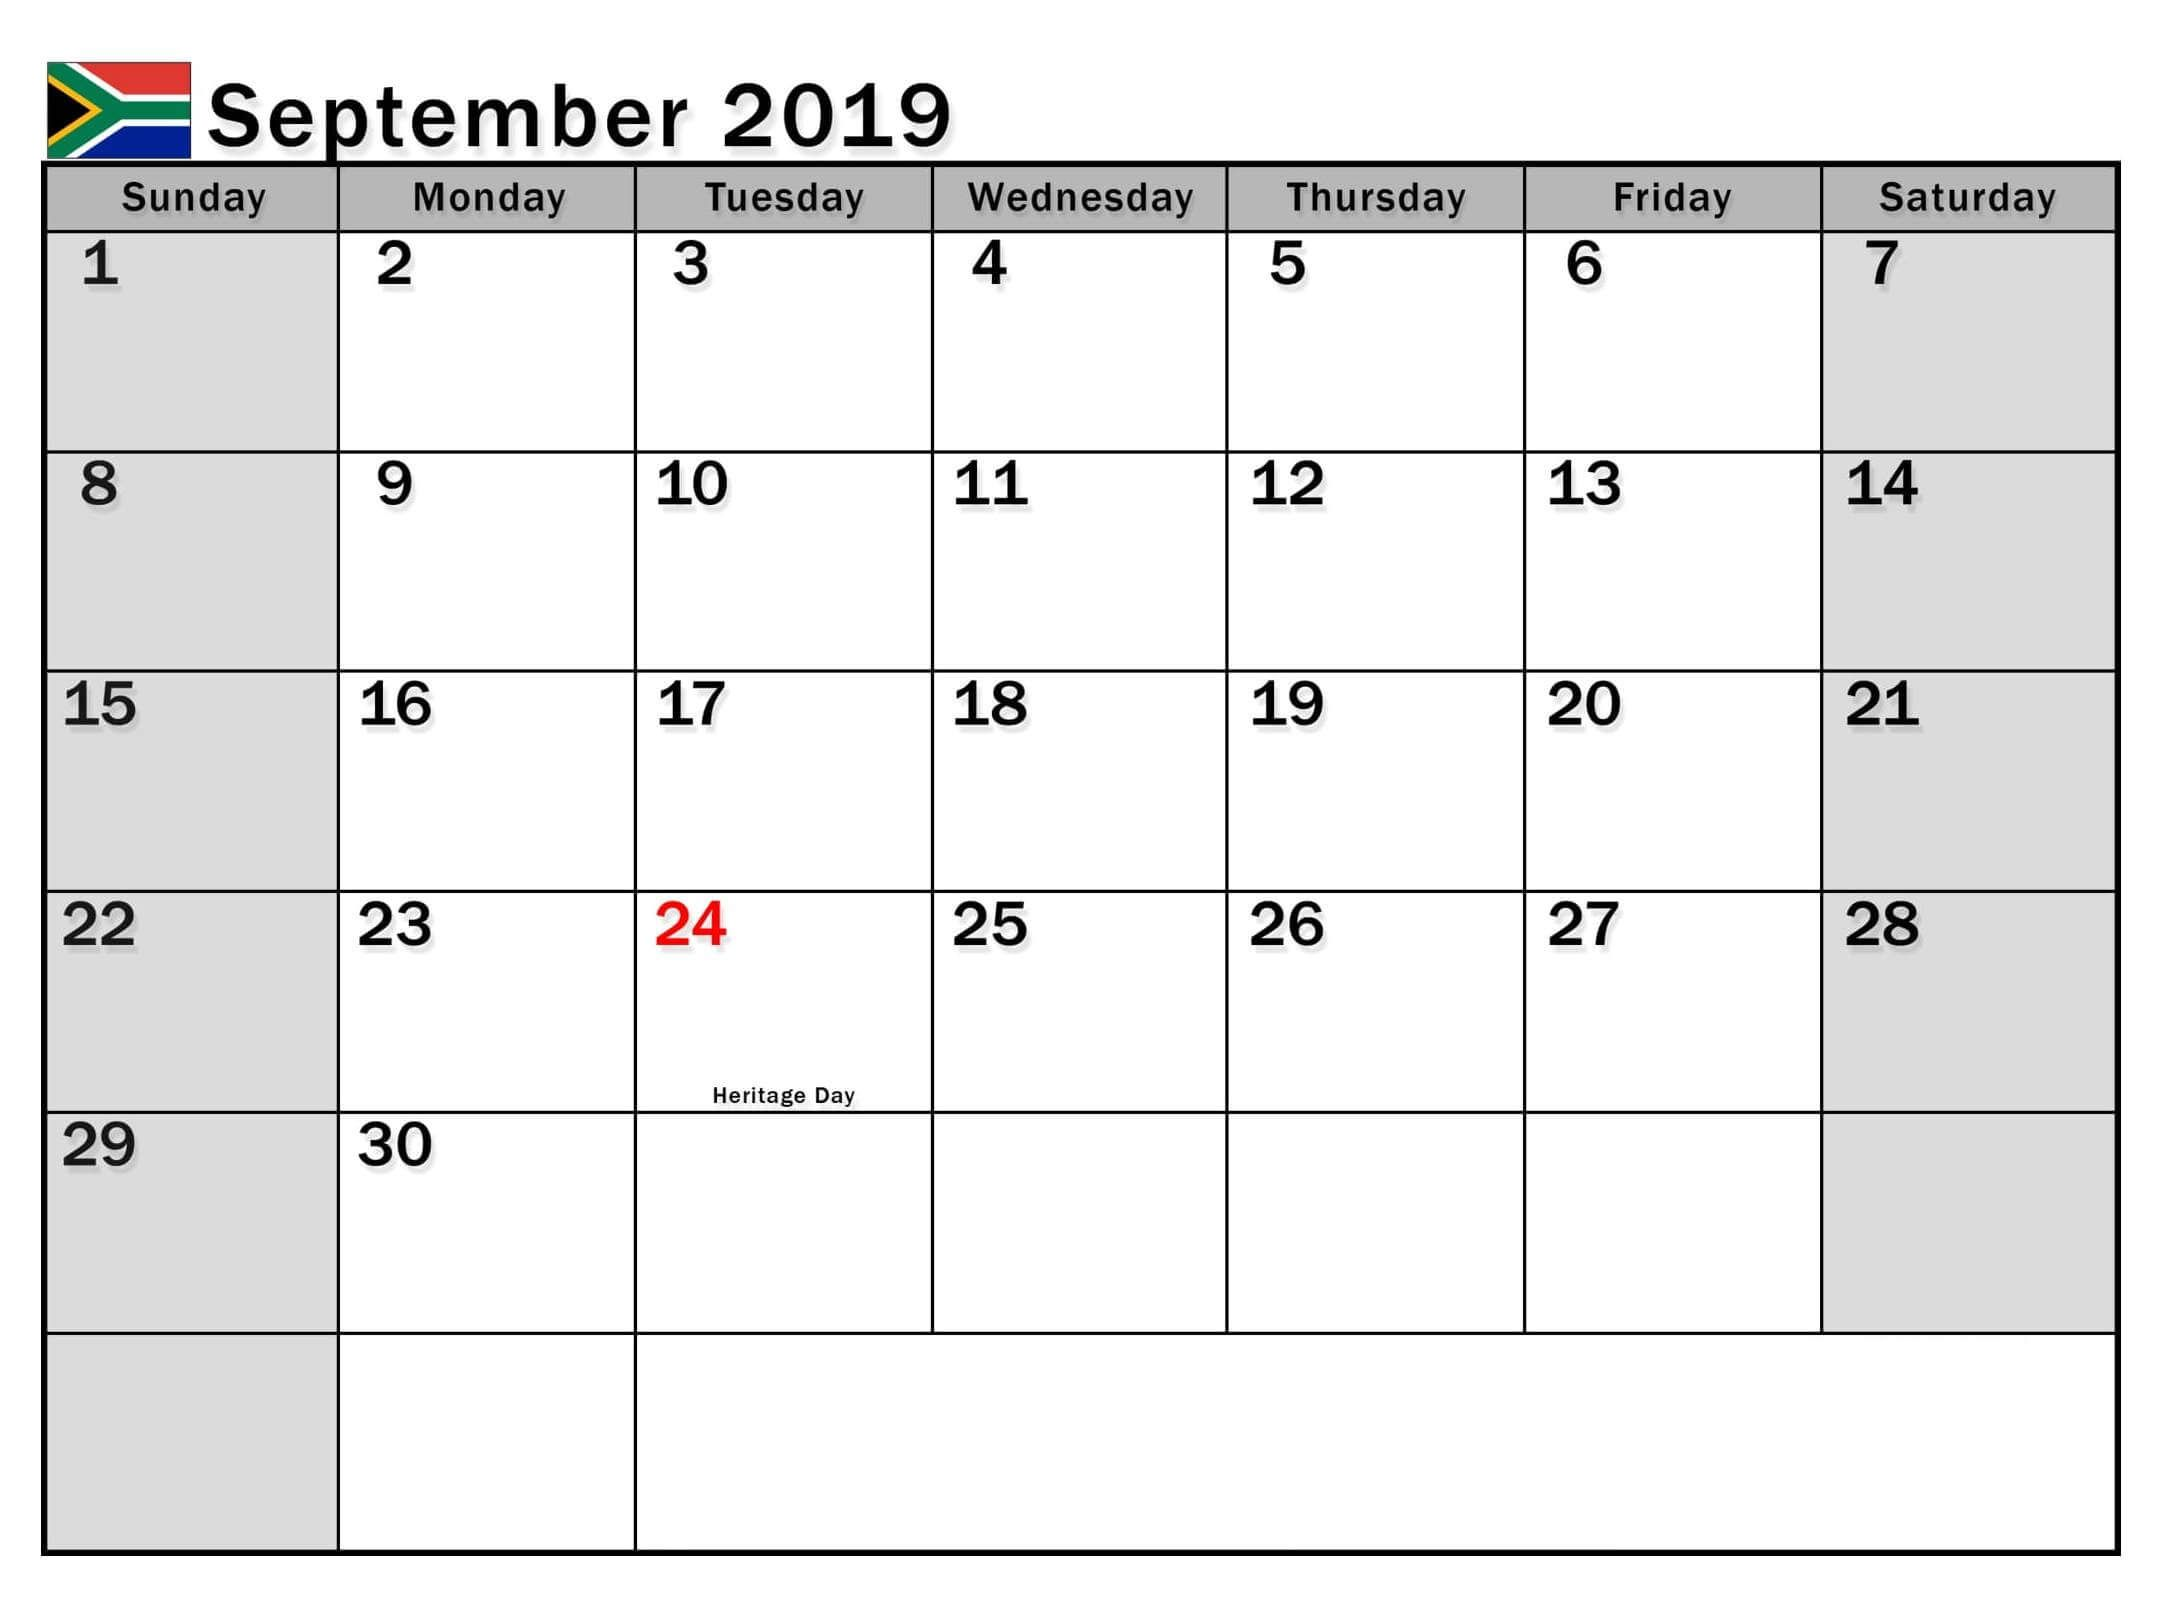 September 2019 Calendar With Holidays Holiday Calendar Holiday